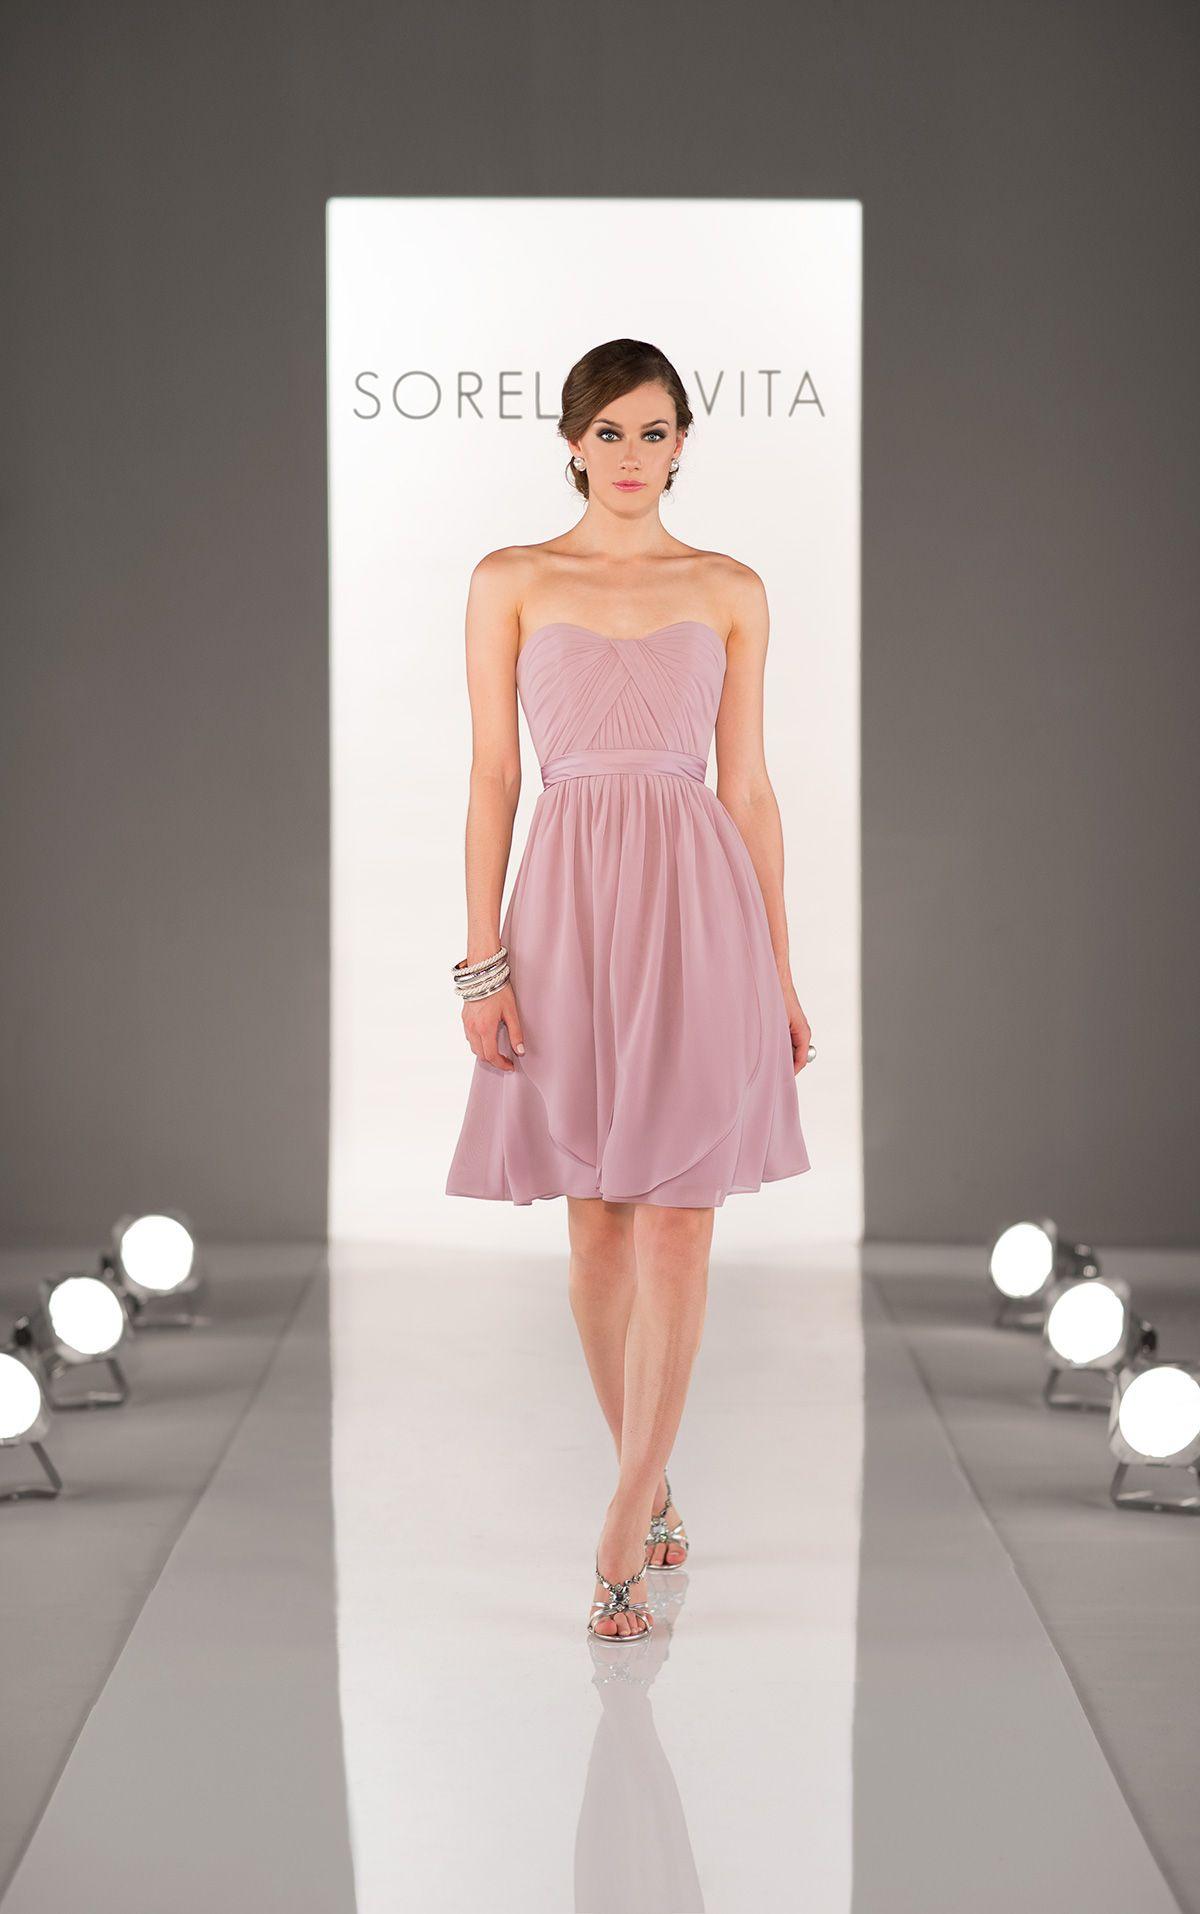 Bridesmaid Dresses | Peach Bridesmaid Dress | Sorella Vita | SORELLA ...